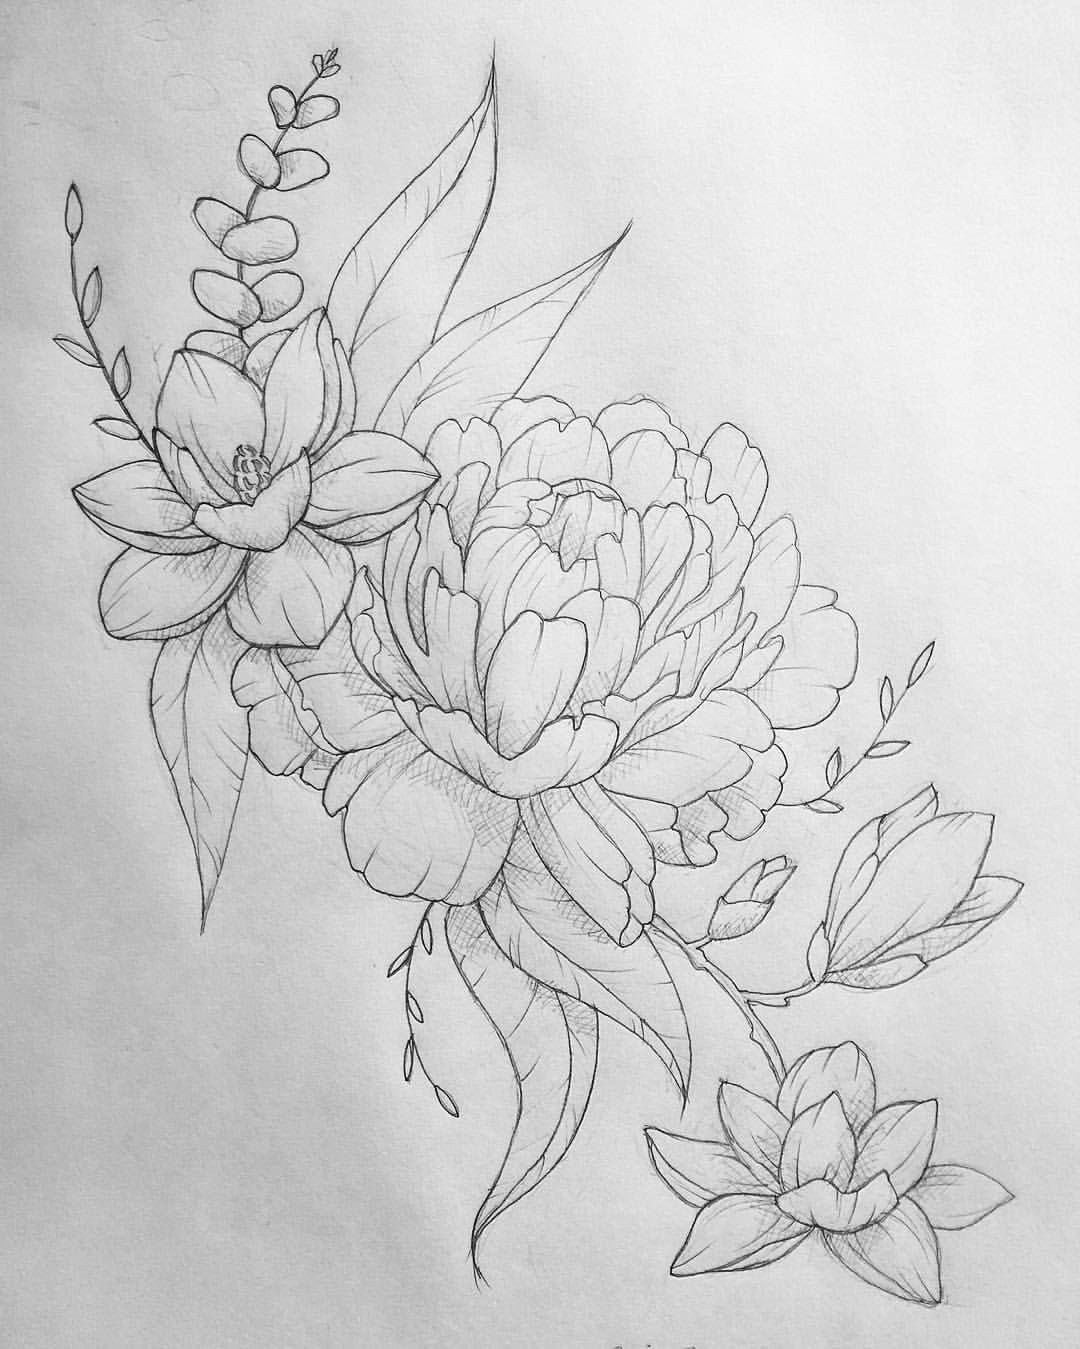 Another One Done Tattoo Peonytattoo Peony Eucalyptus Magnolia Magnoliatattoo Flash Linedrawing Picture Tattoos Shoulder Cap Tattoo Half Sleeve Tattoo